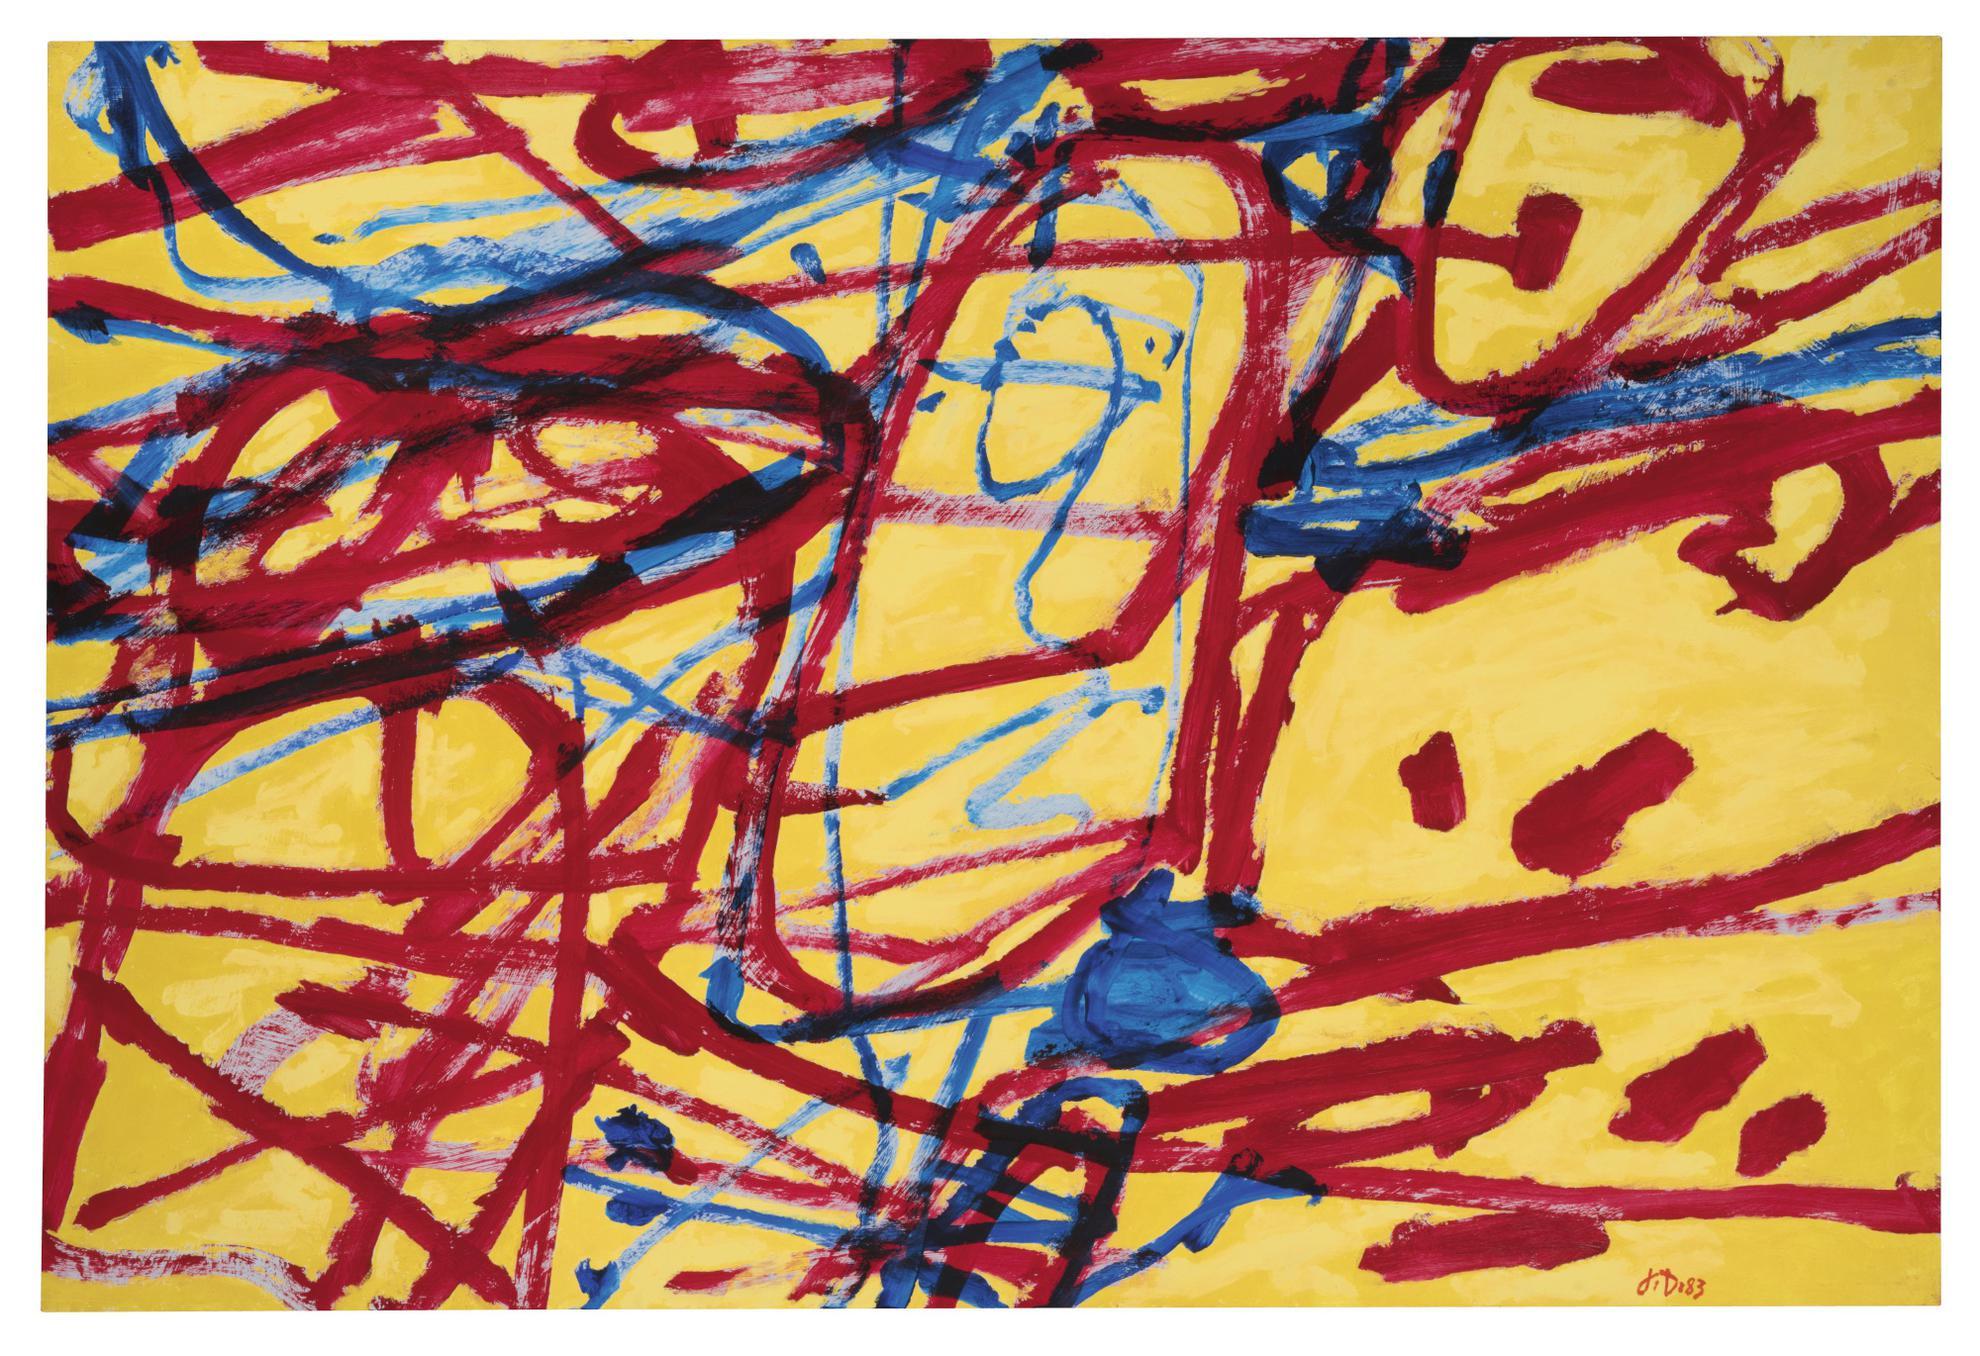 Jean Dubuffet-Mire G 78 (Kowloon)-1983